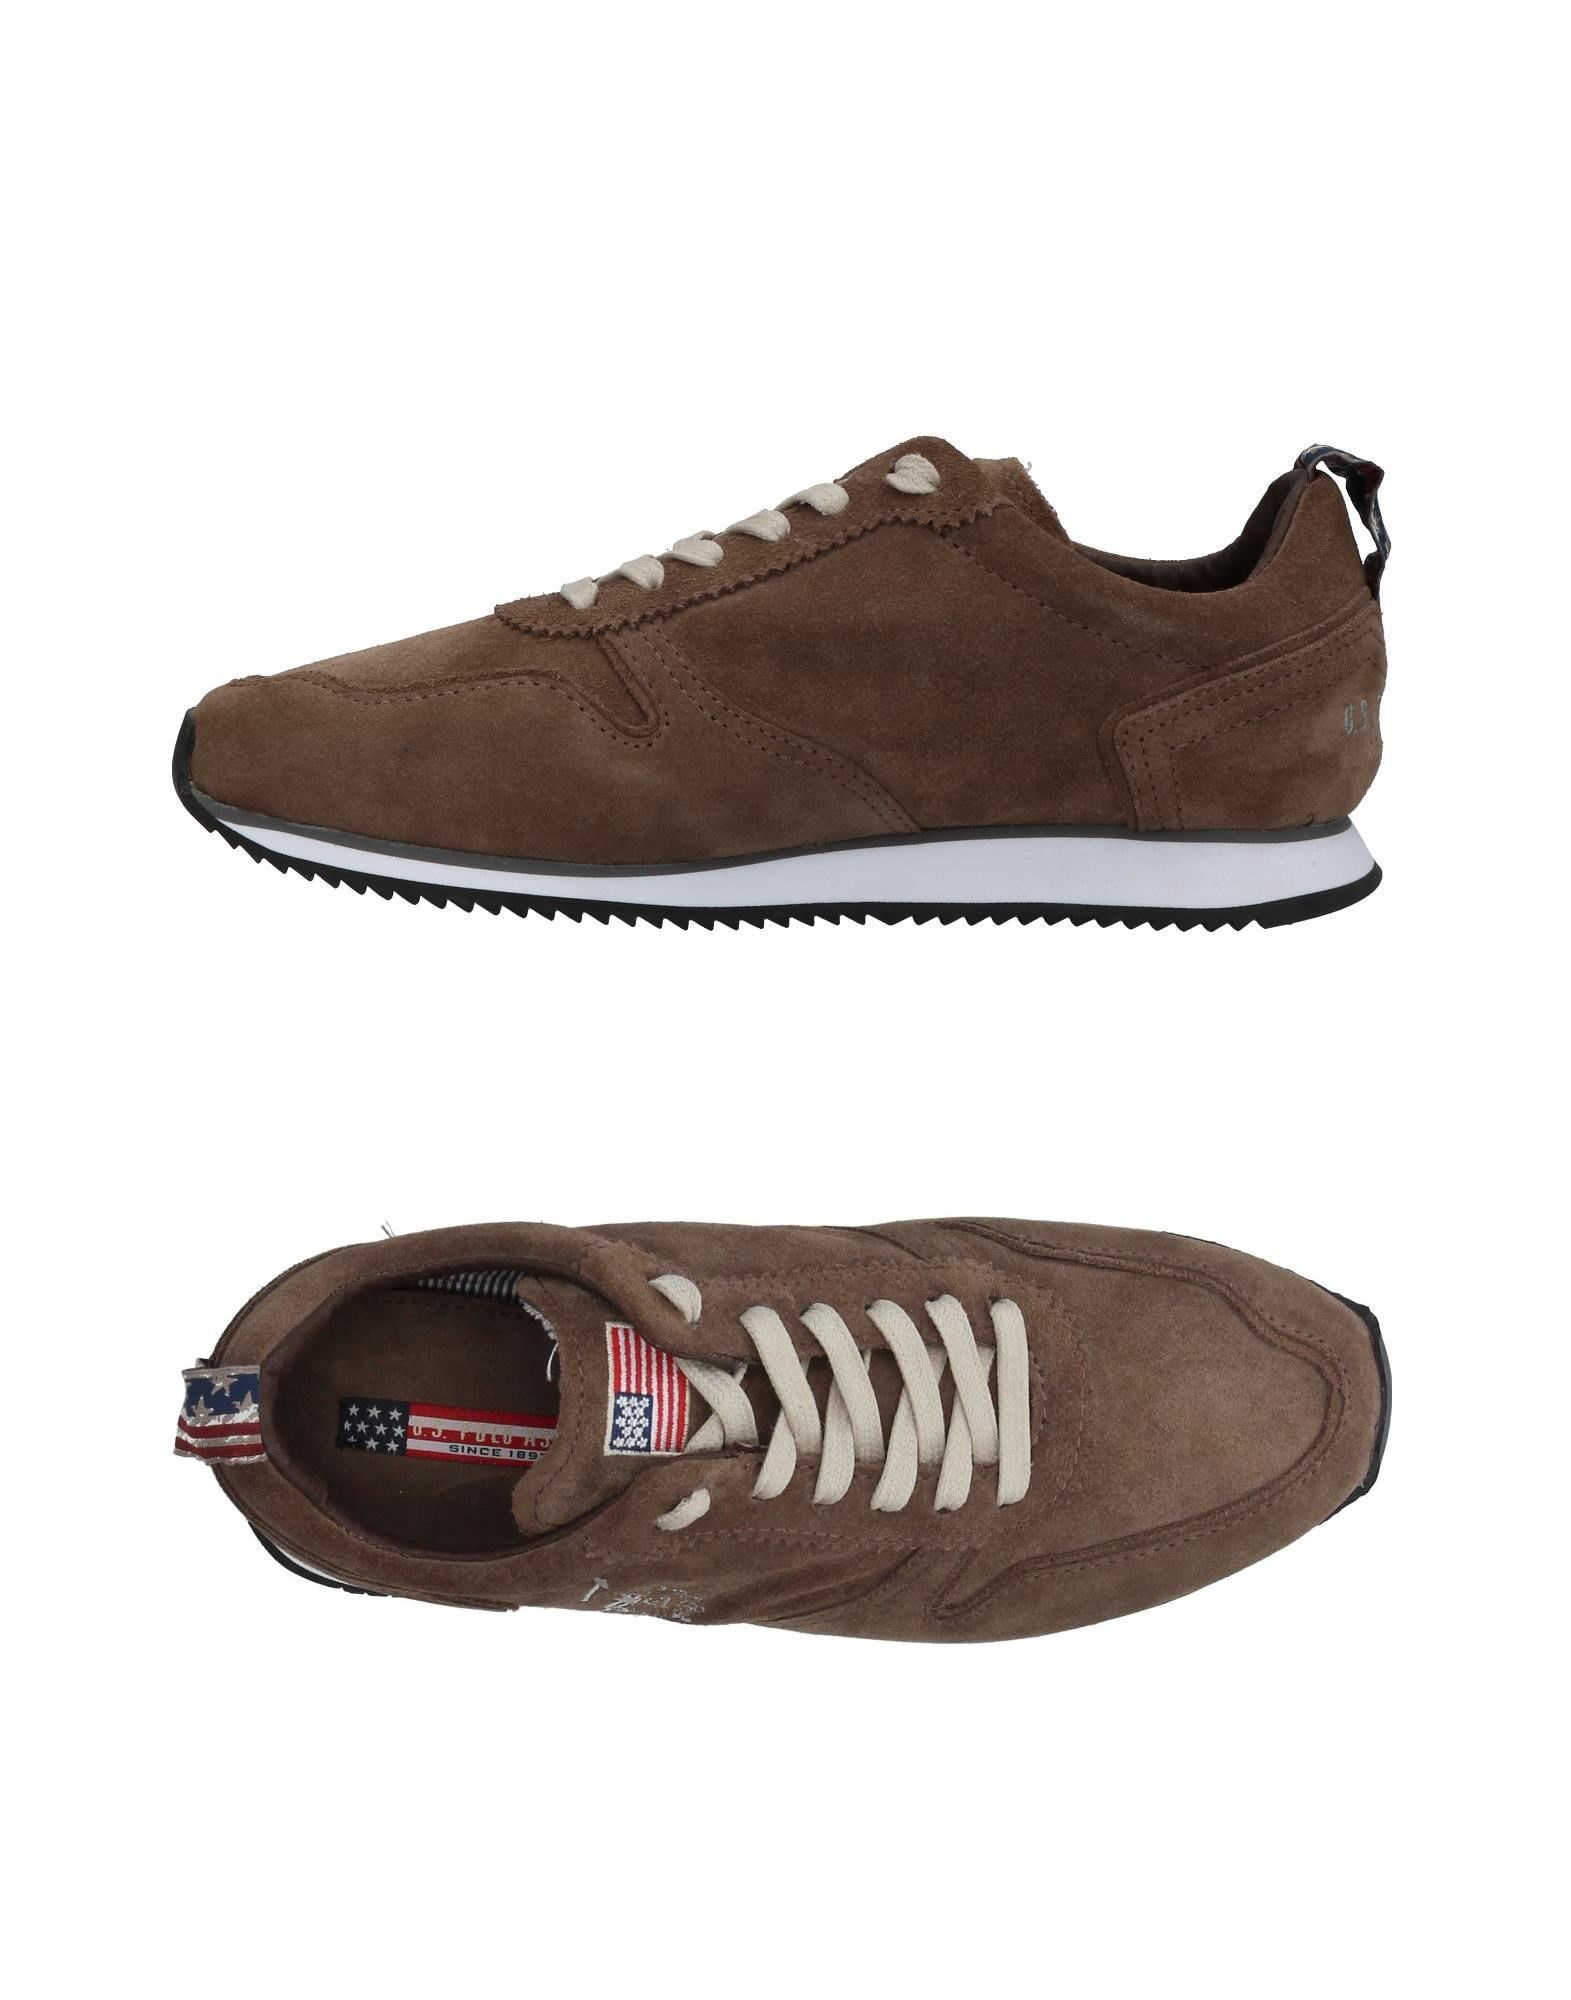 Sneakers U.S.Polo Assn. Femme - Sneakers U.S.Polo Assn. sur